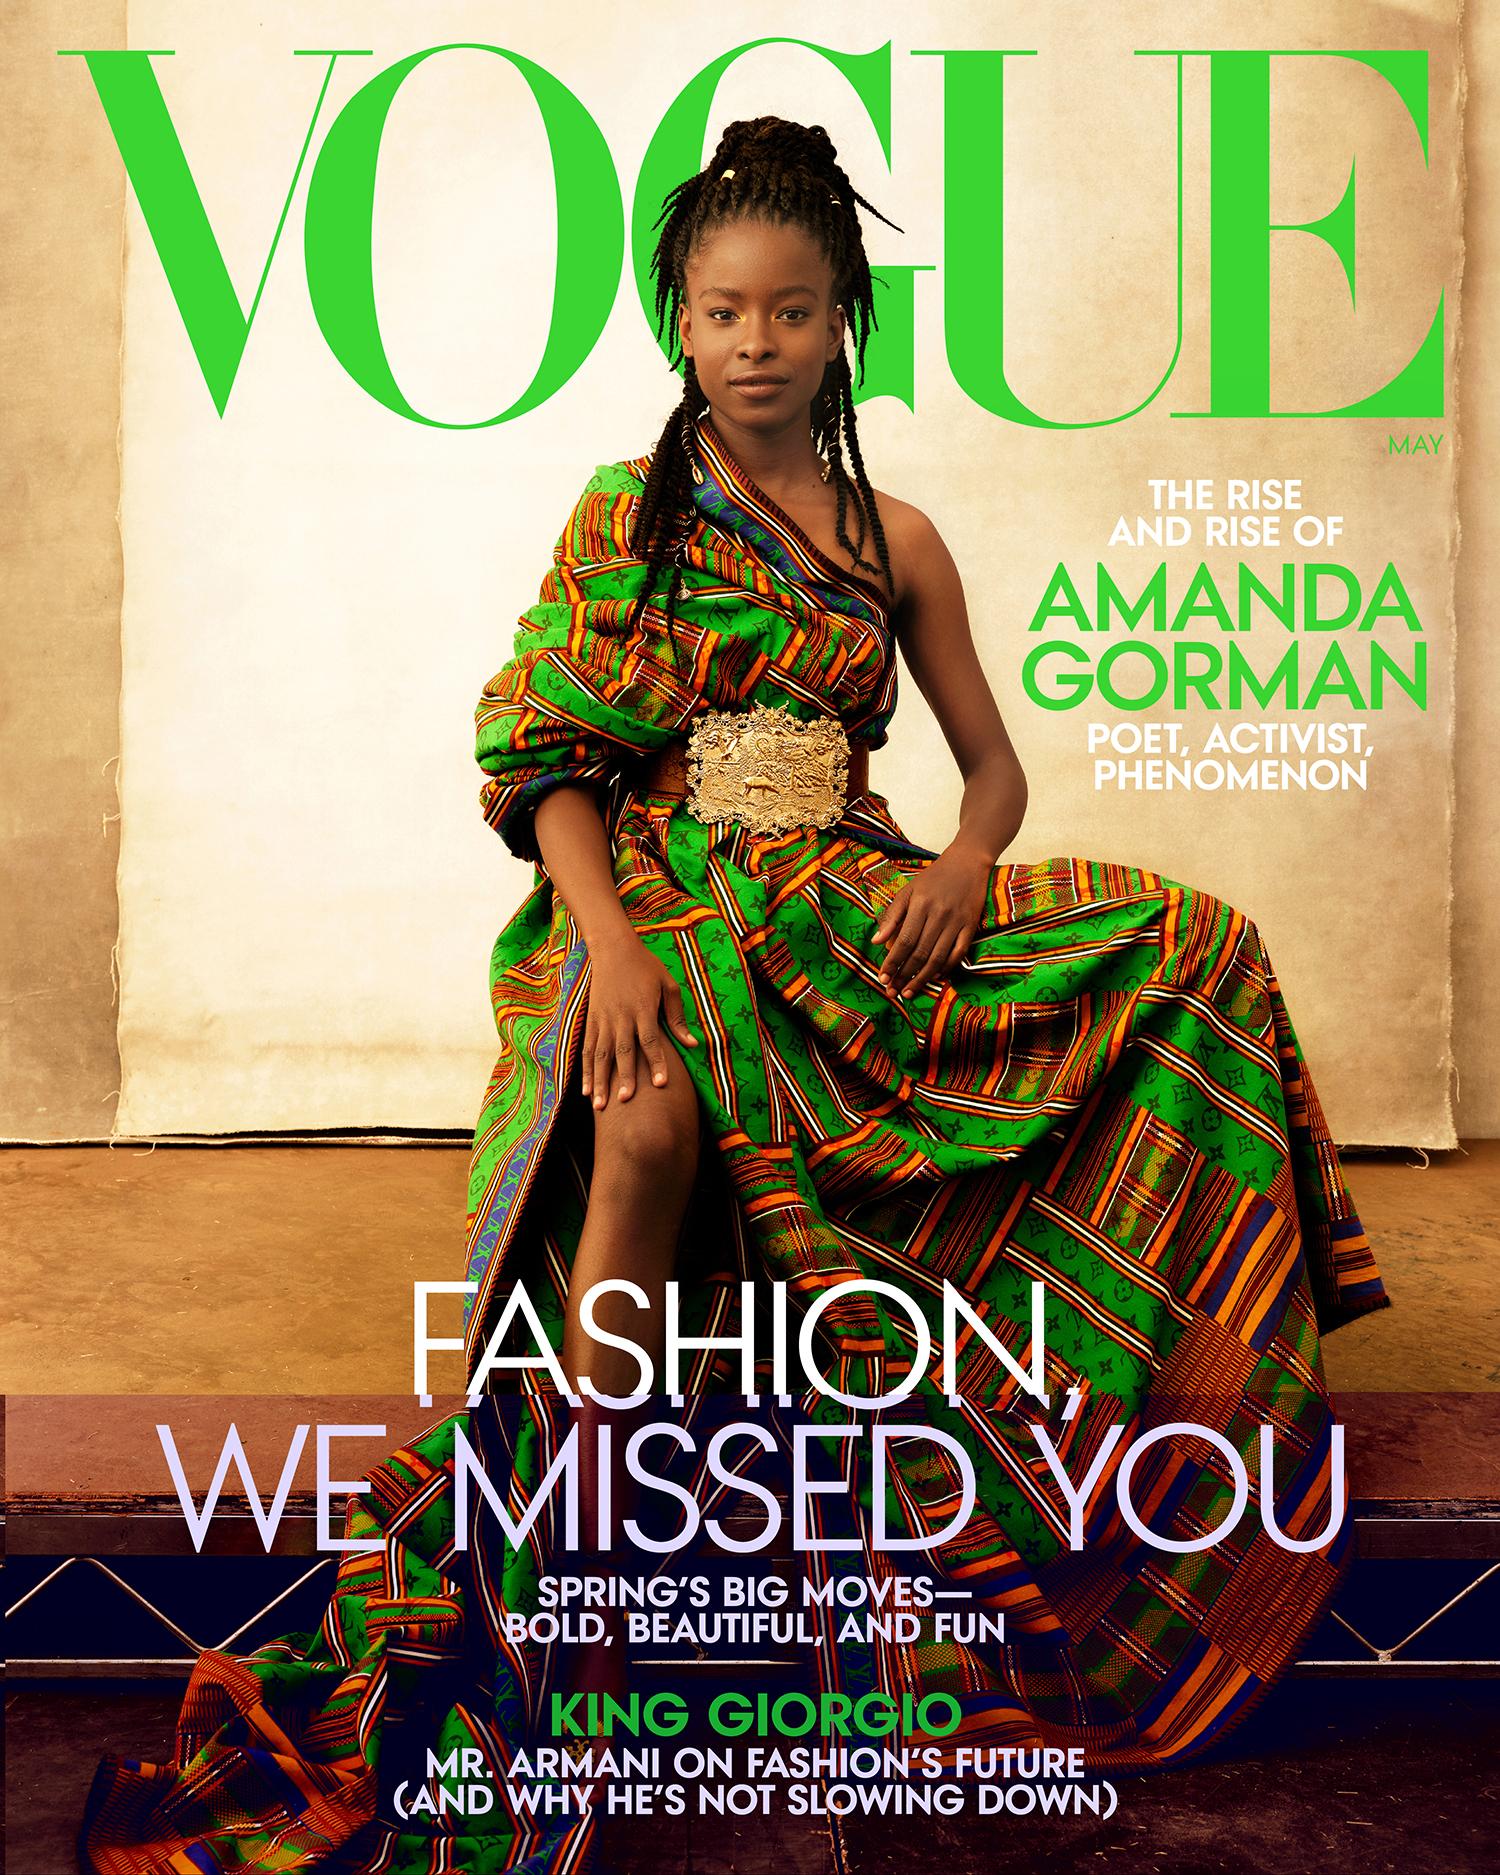 Amanda Gorman for Vogue - DO NOT REUSE